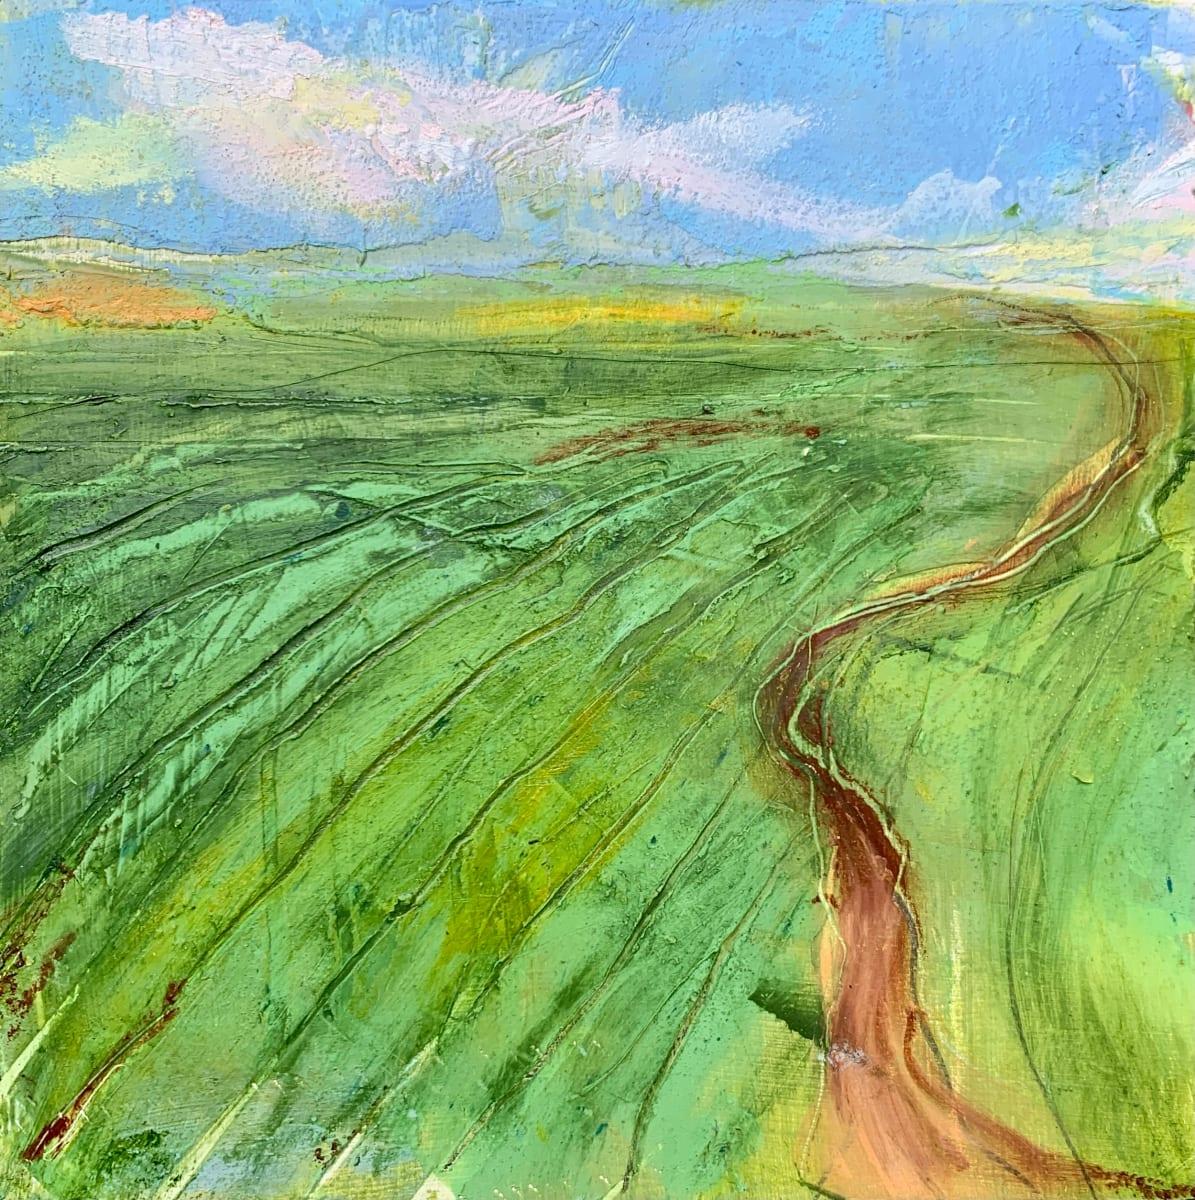 Little Landscape #1 by Sally Hootnick